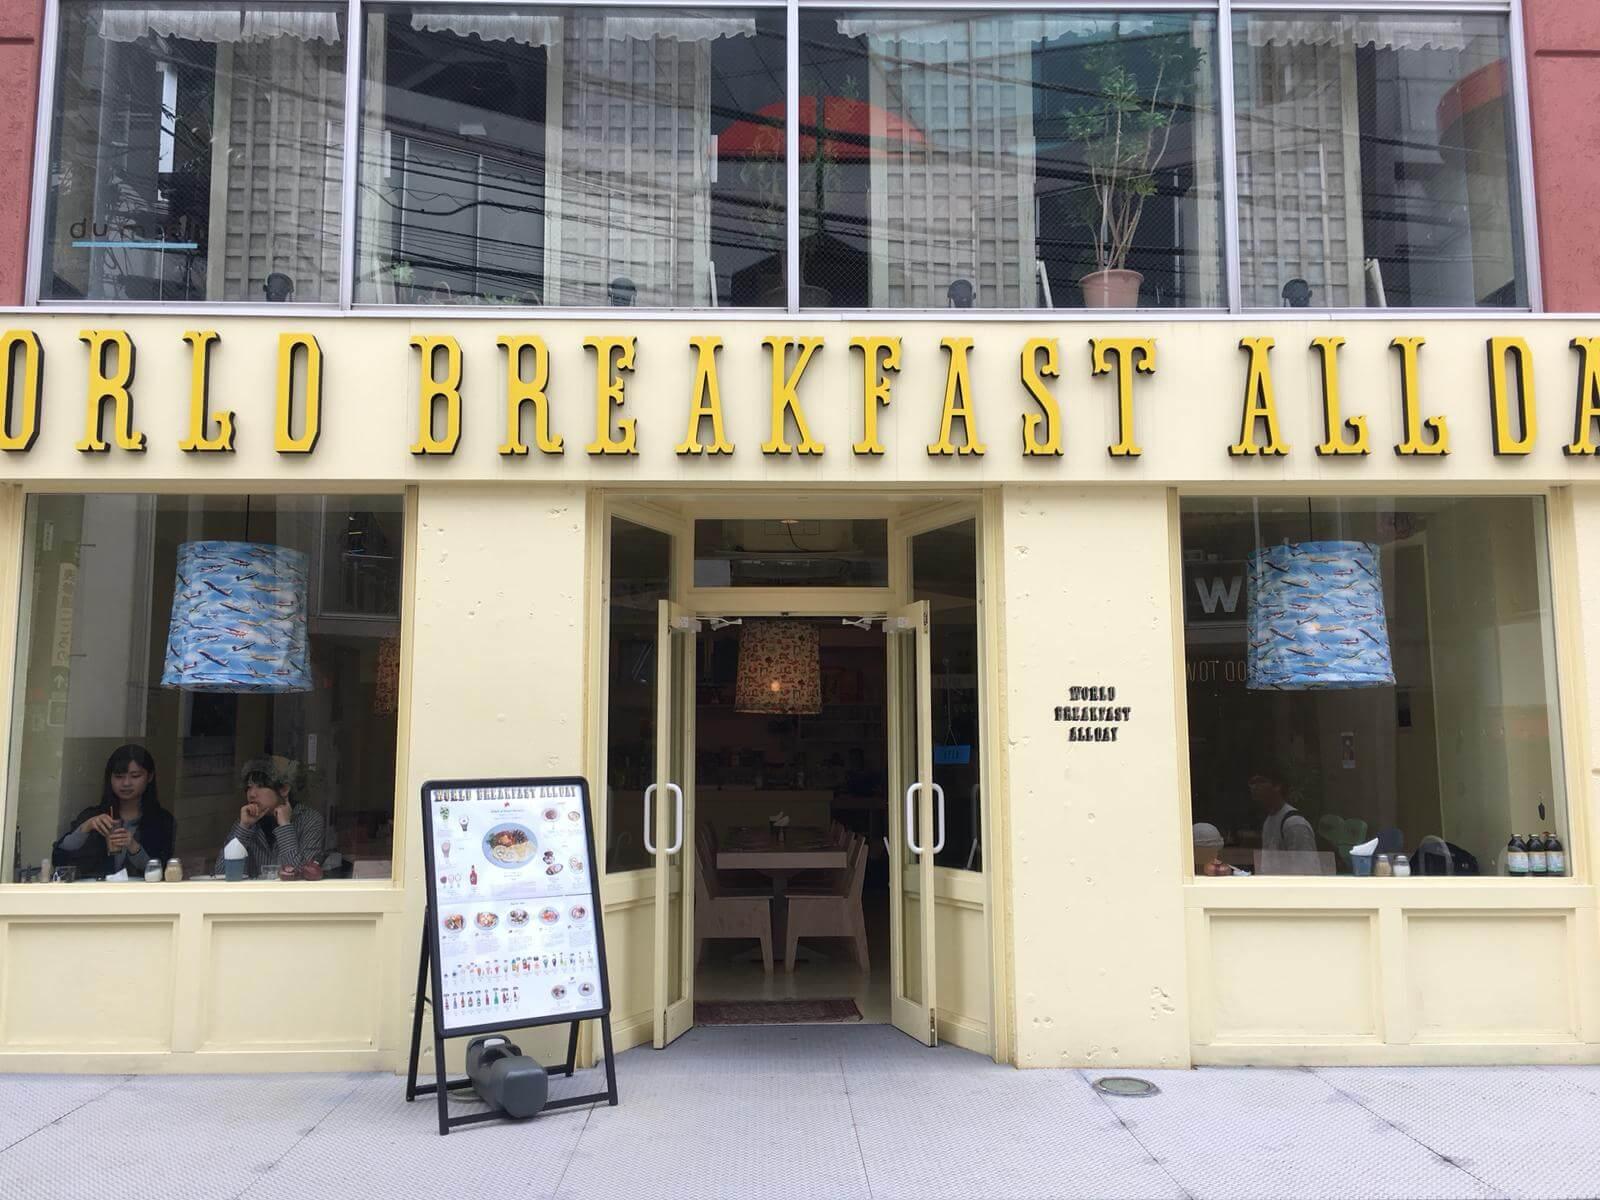 World Breakfast Allday8